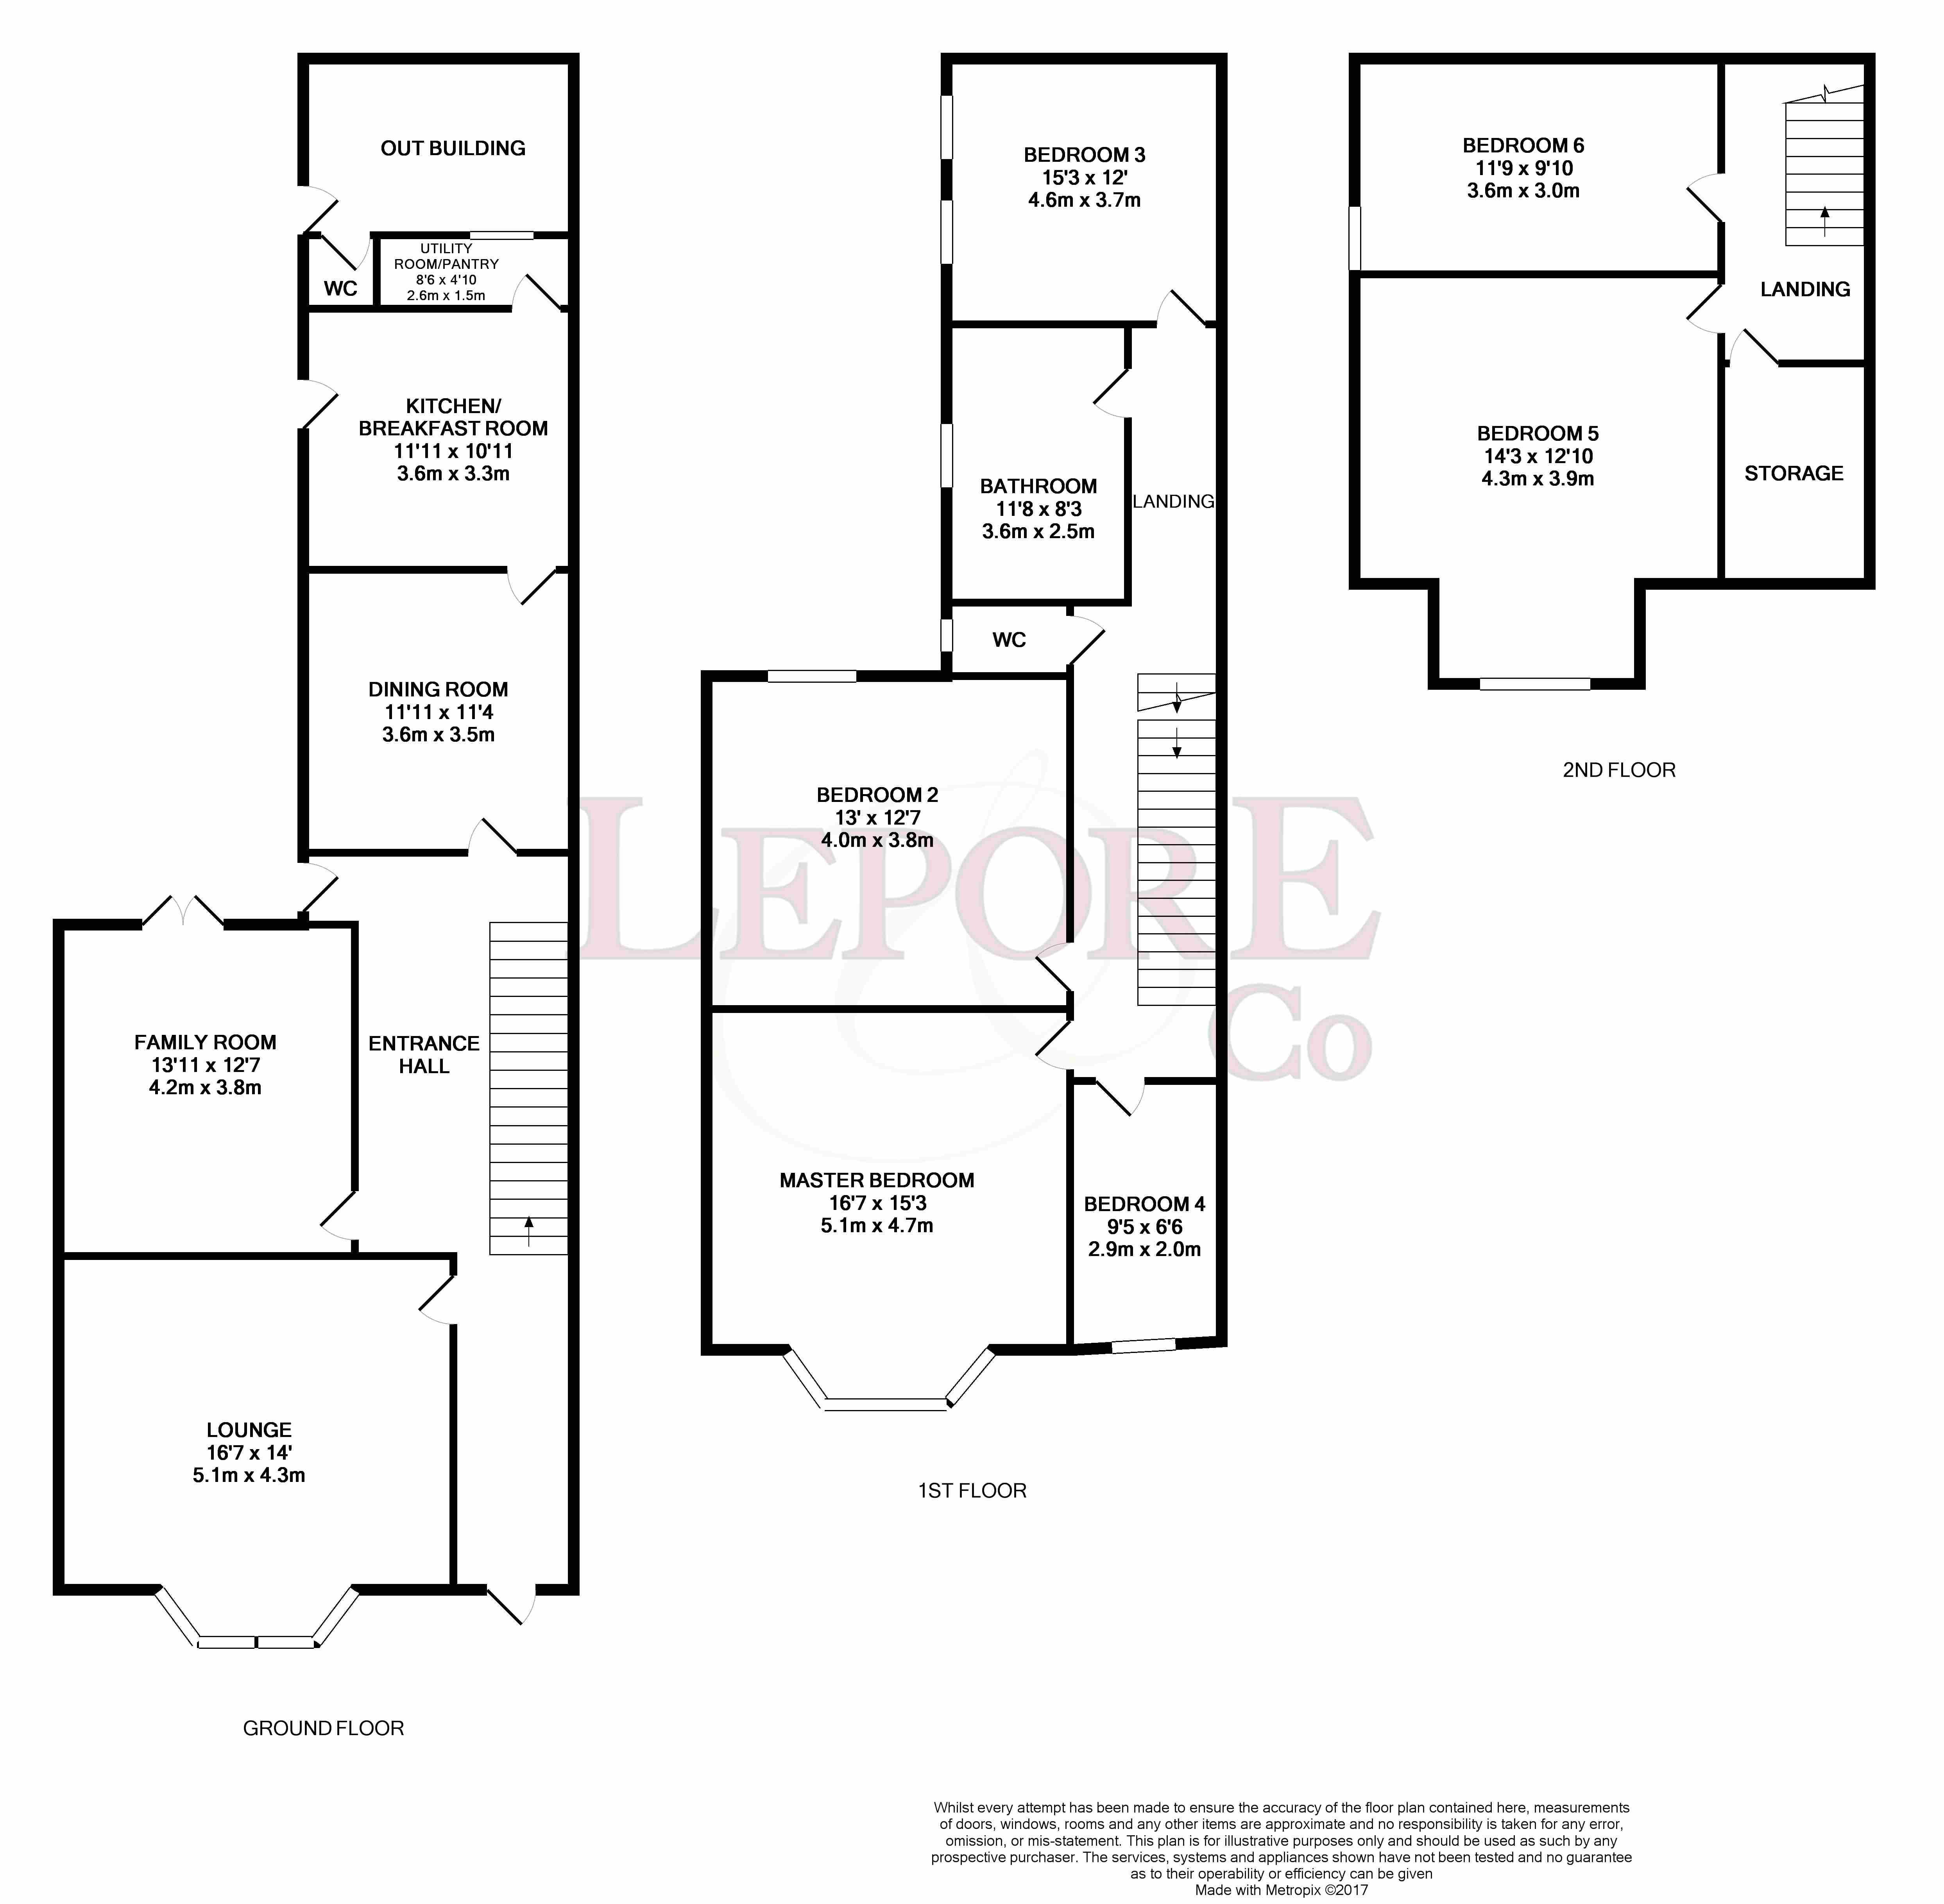 clapham road  bedford mk41  6 bedroom semi-detached house for sale